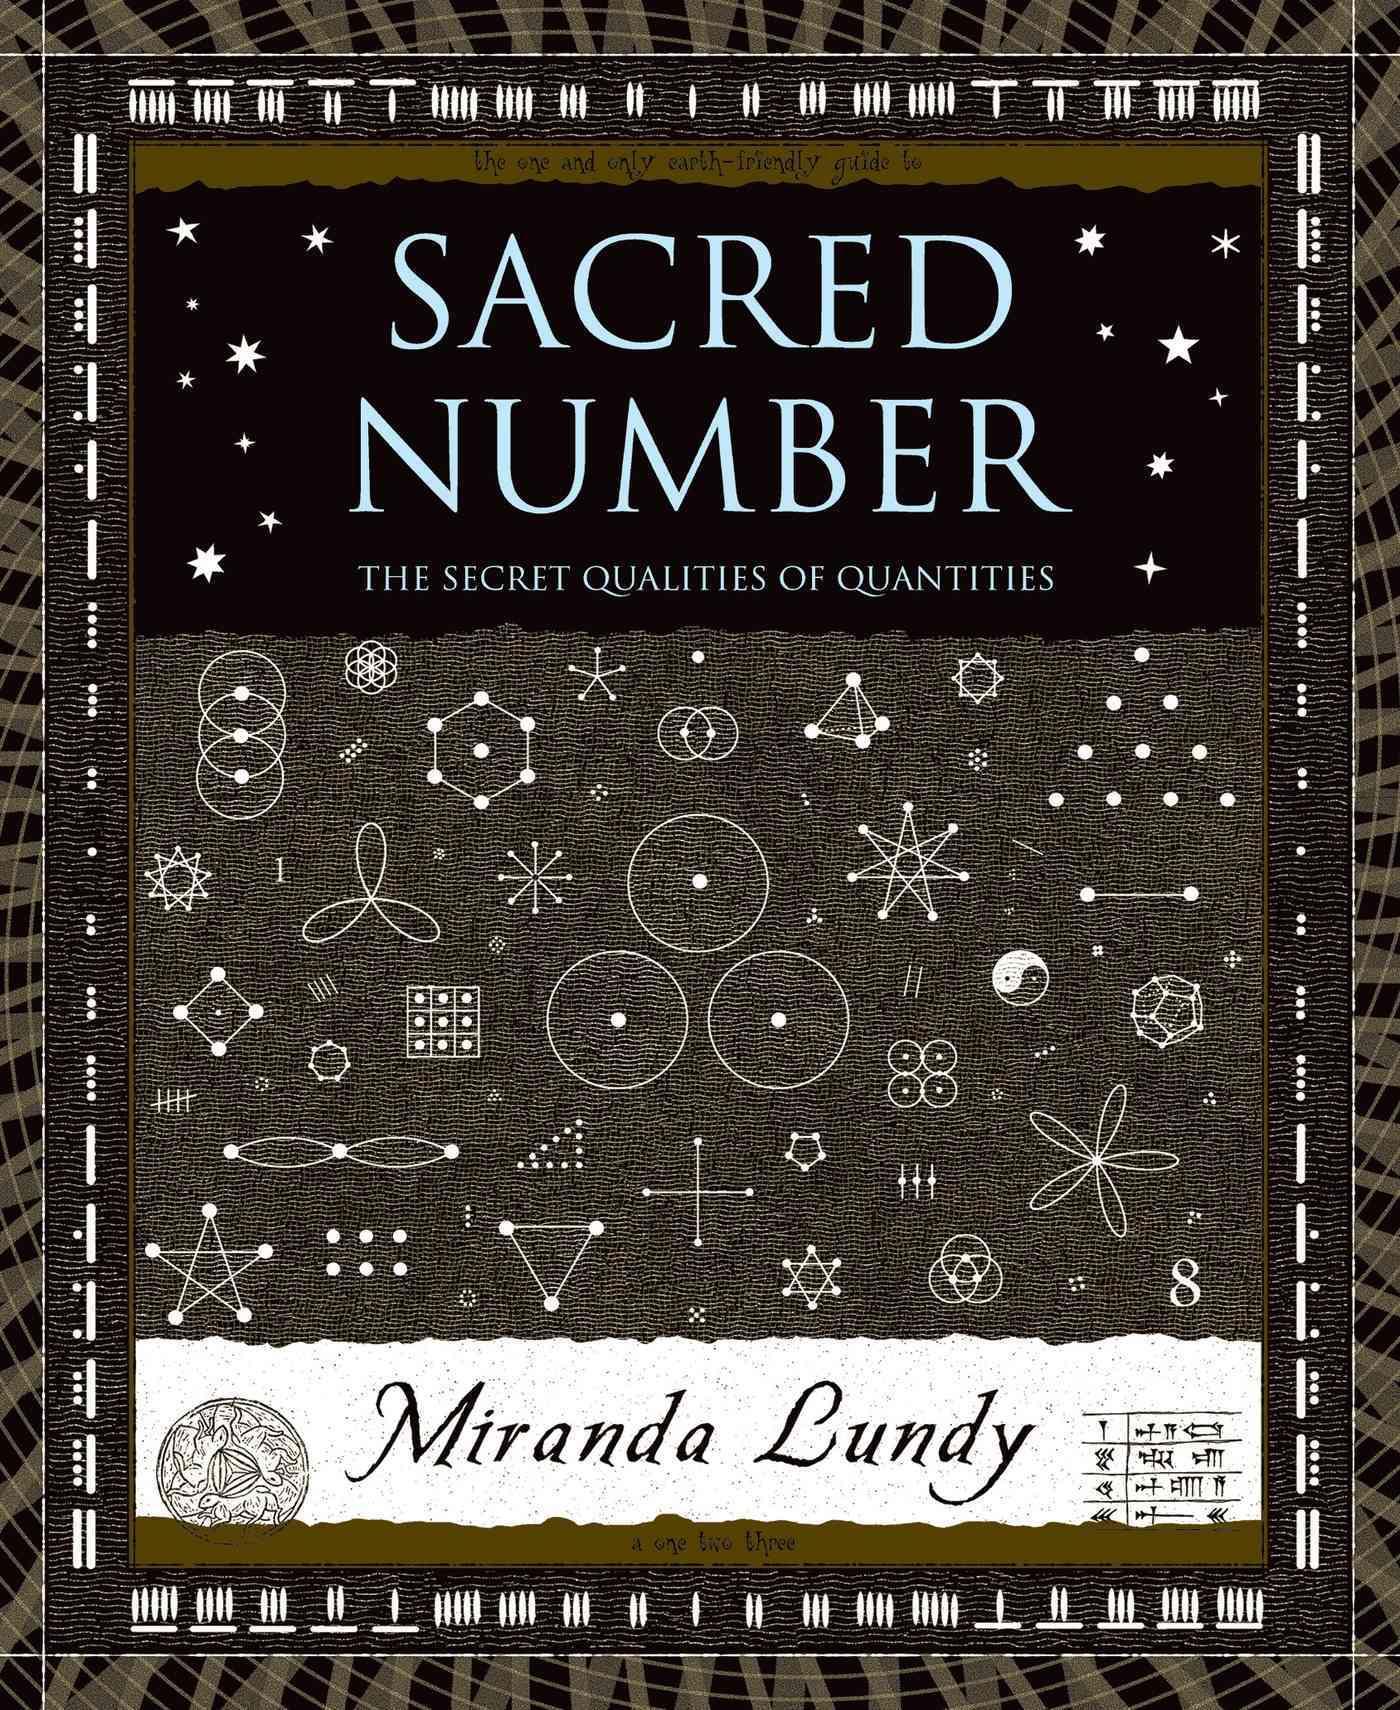 Sacred Number By Lundy, Miranda/ Lundy, Miranda (ILT)/ Tetlow, Adam (ILT)/ Henry, Richard (FRW)